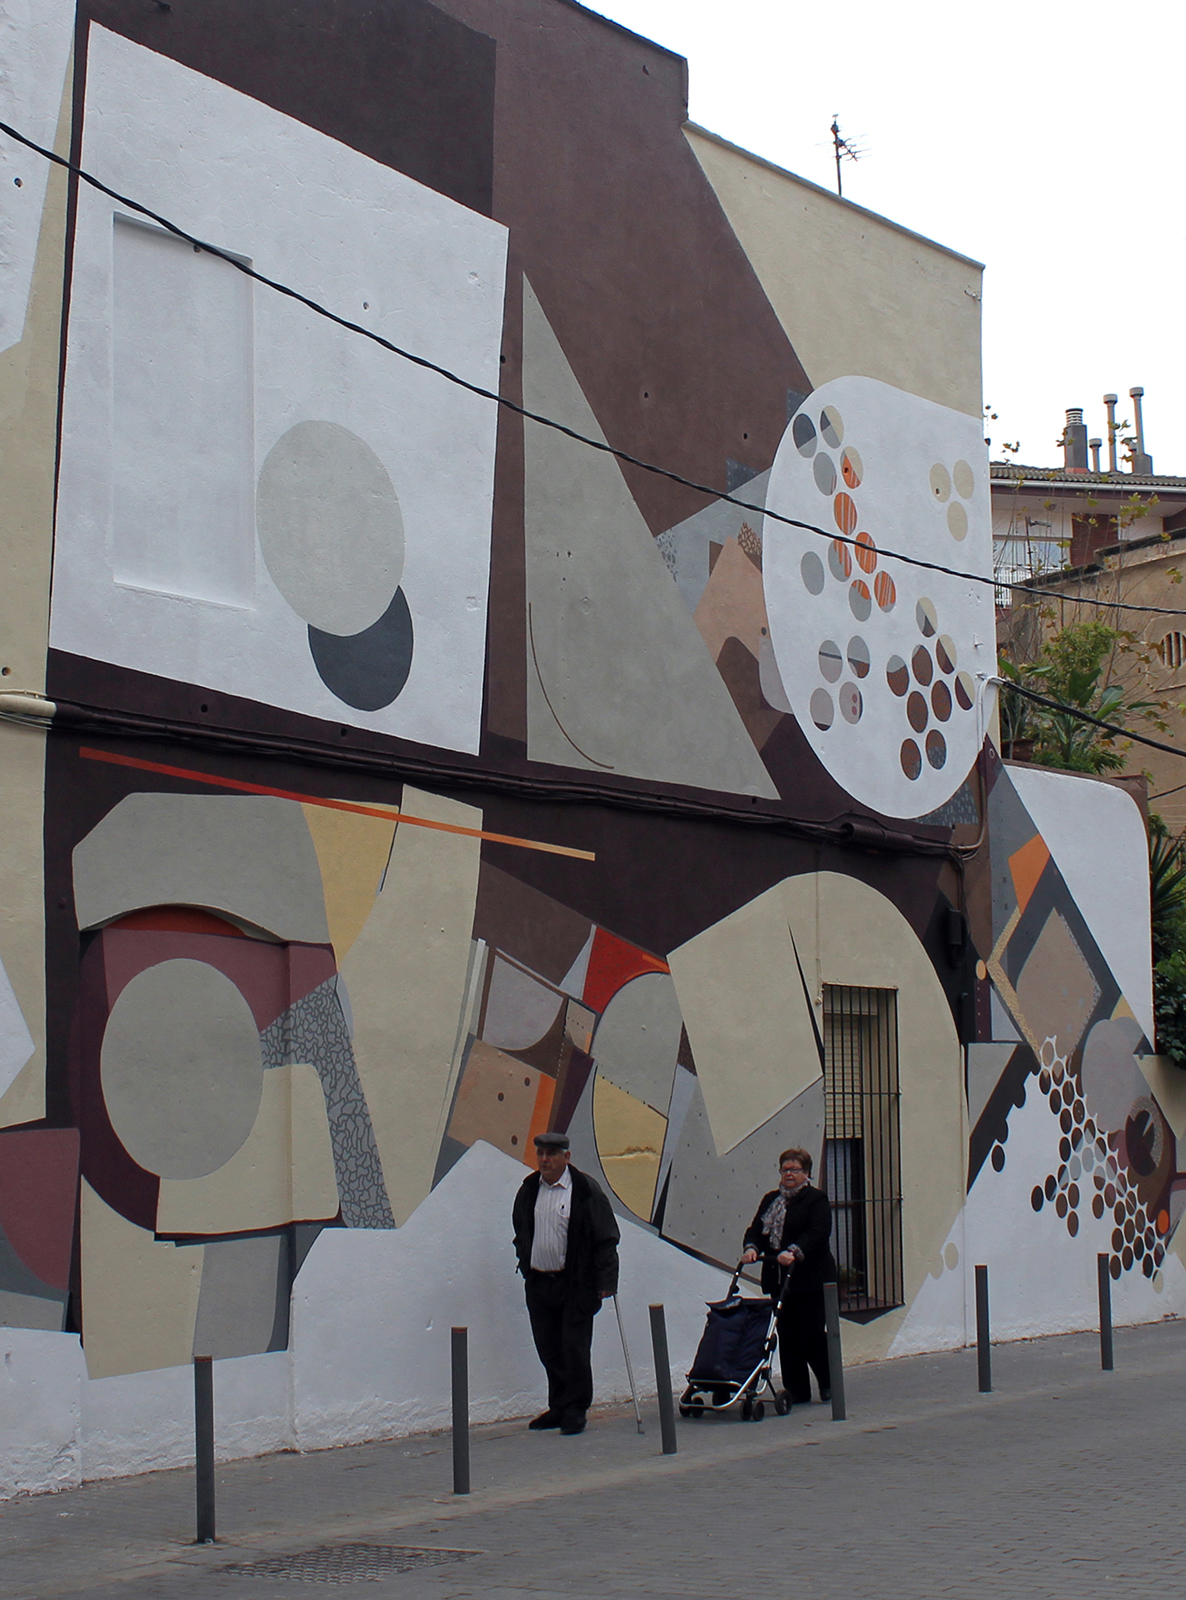 spogo-new-mural-for-openwalls-barcelona-05